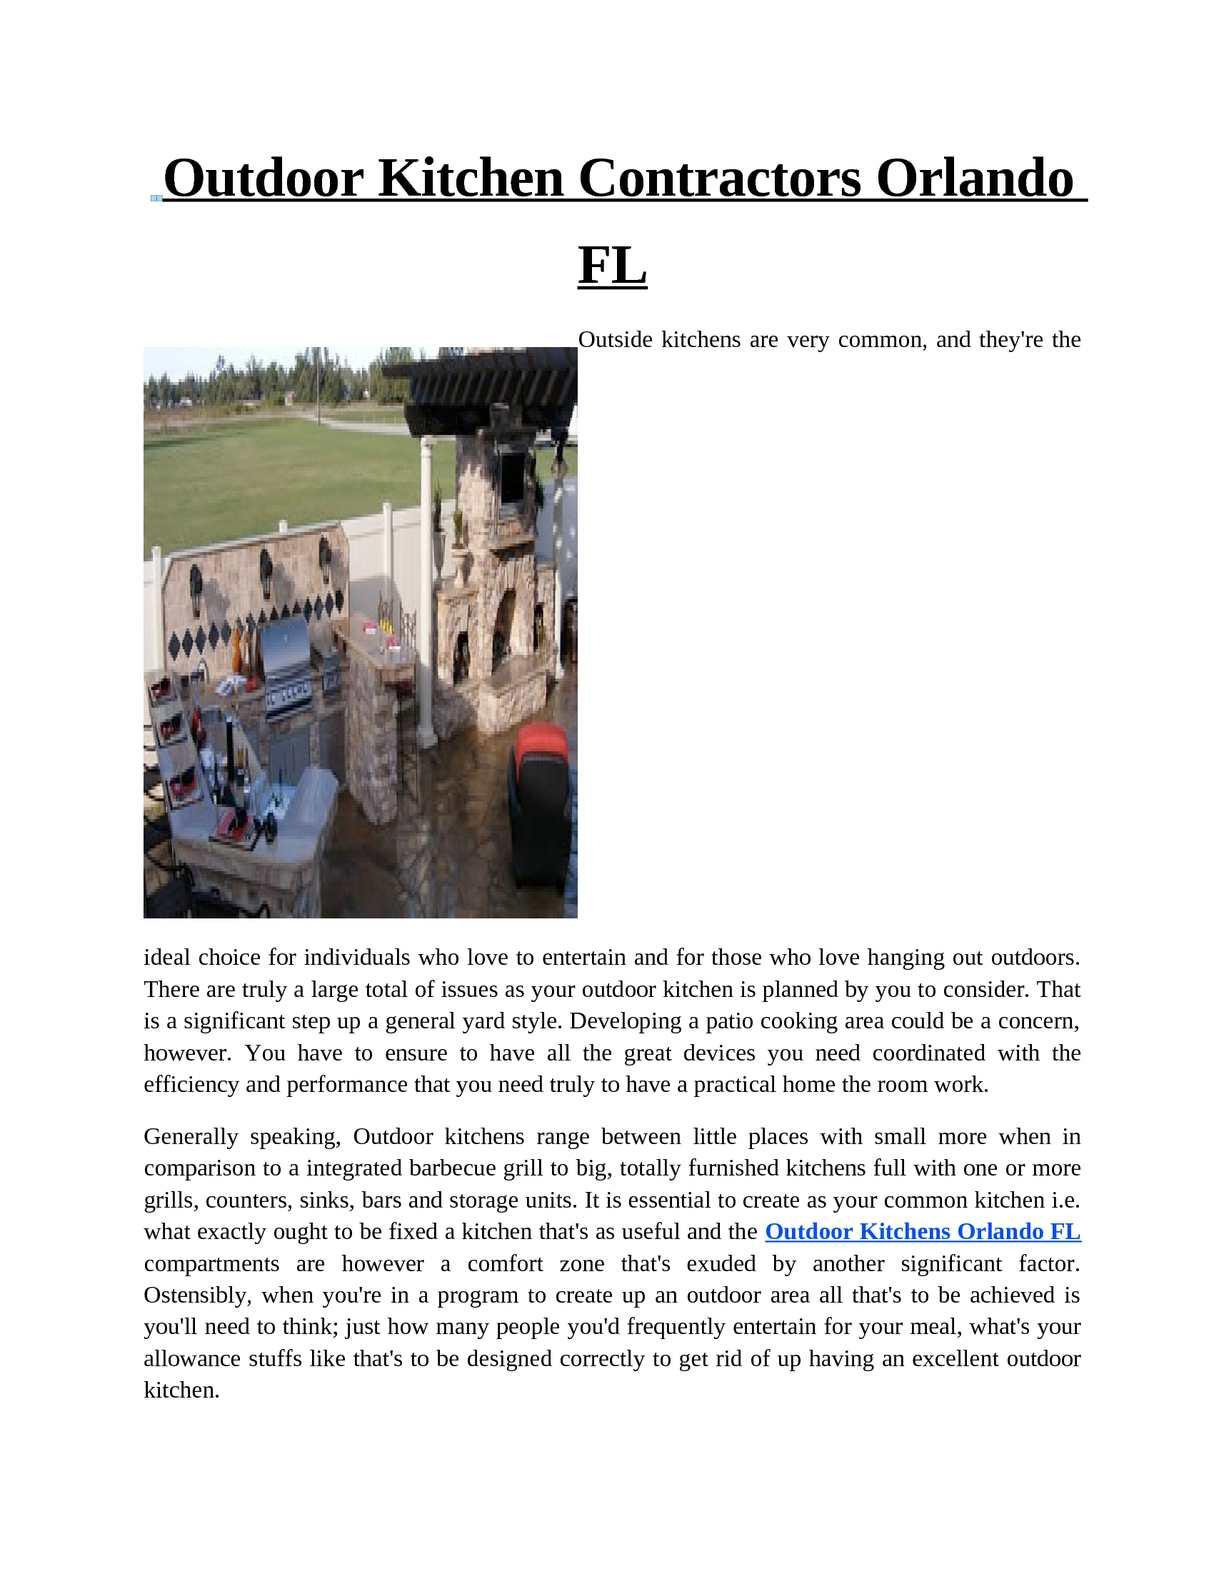 Calameo Outdoor Kitchens Orlando Fl